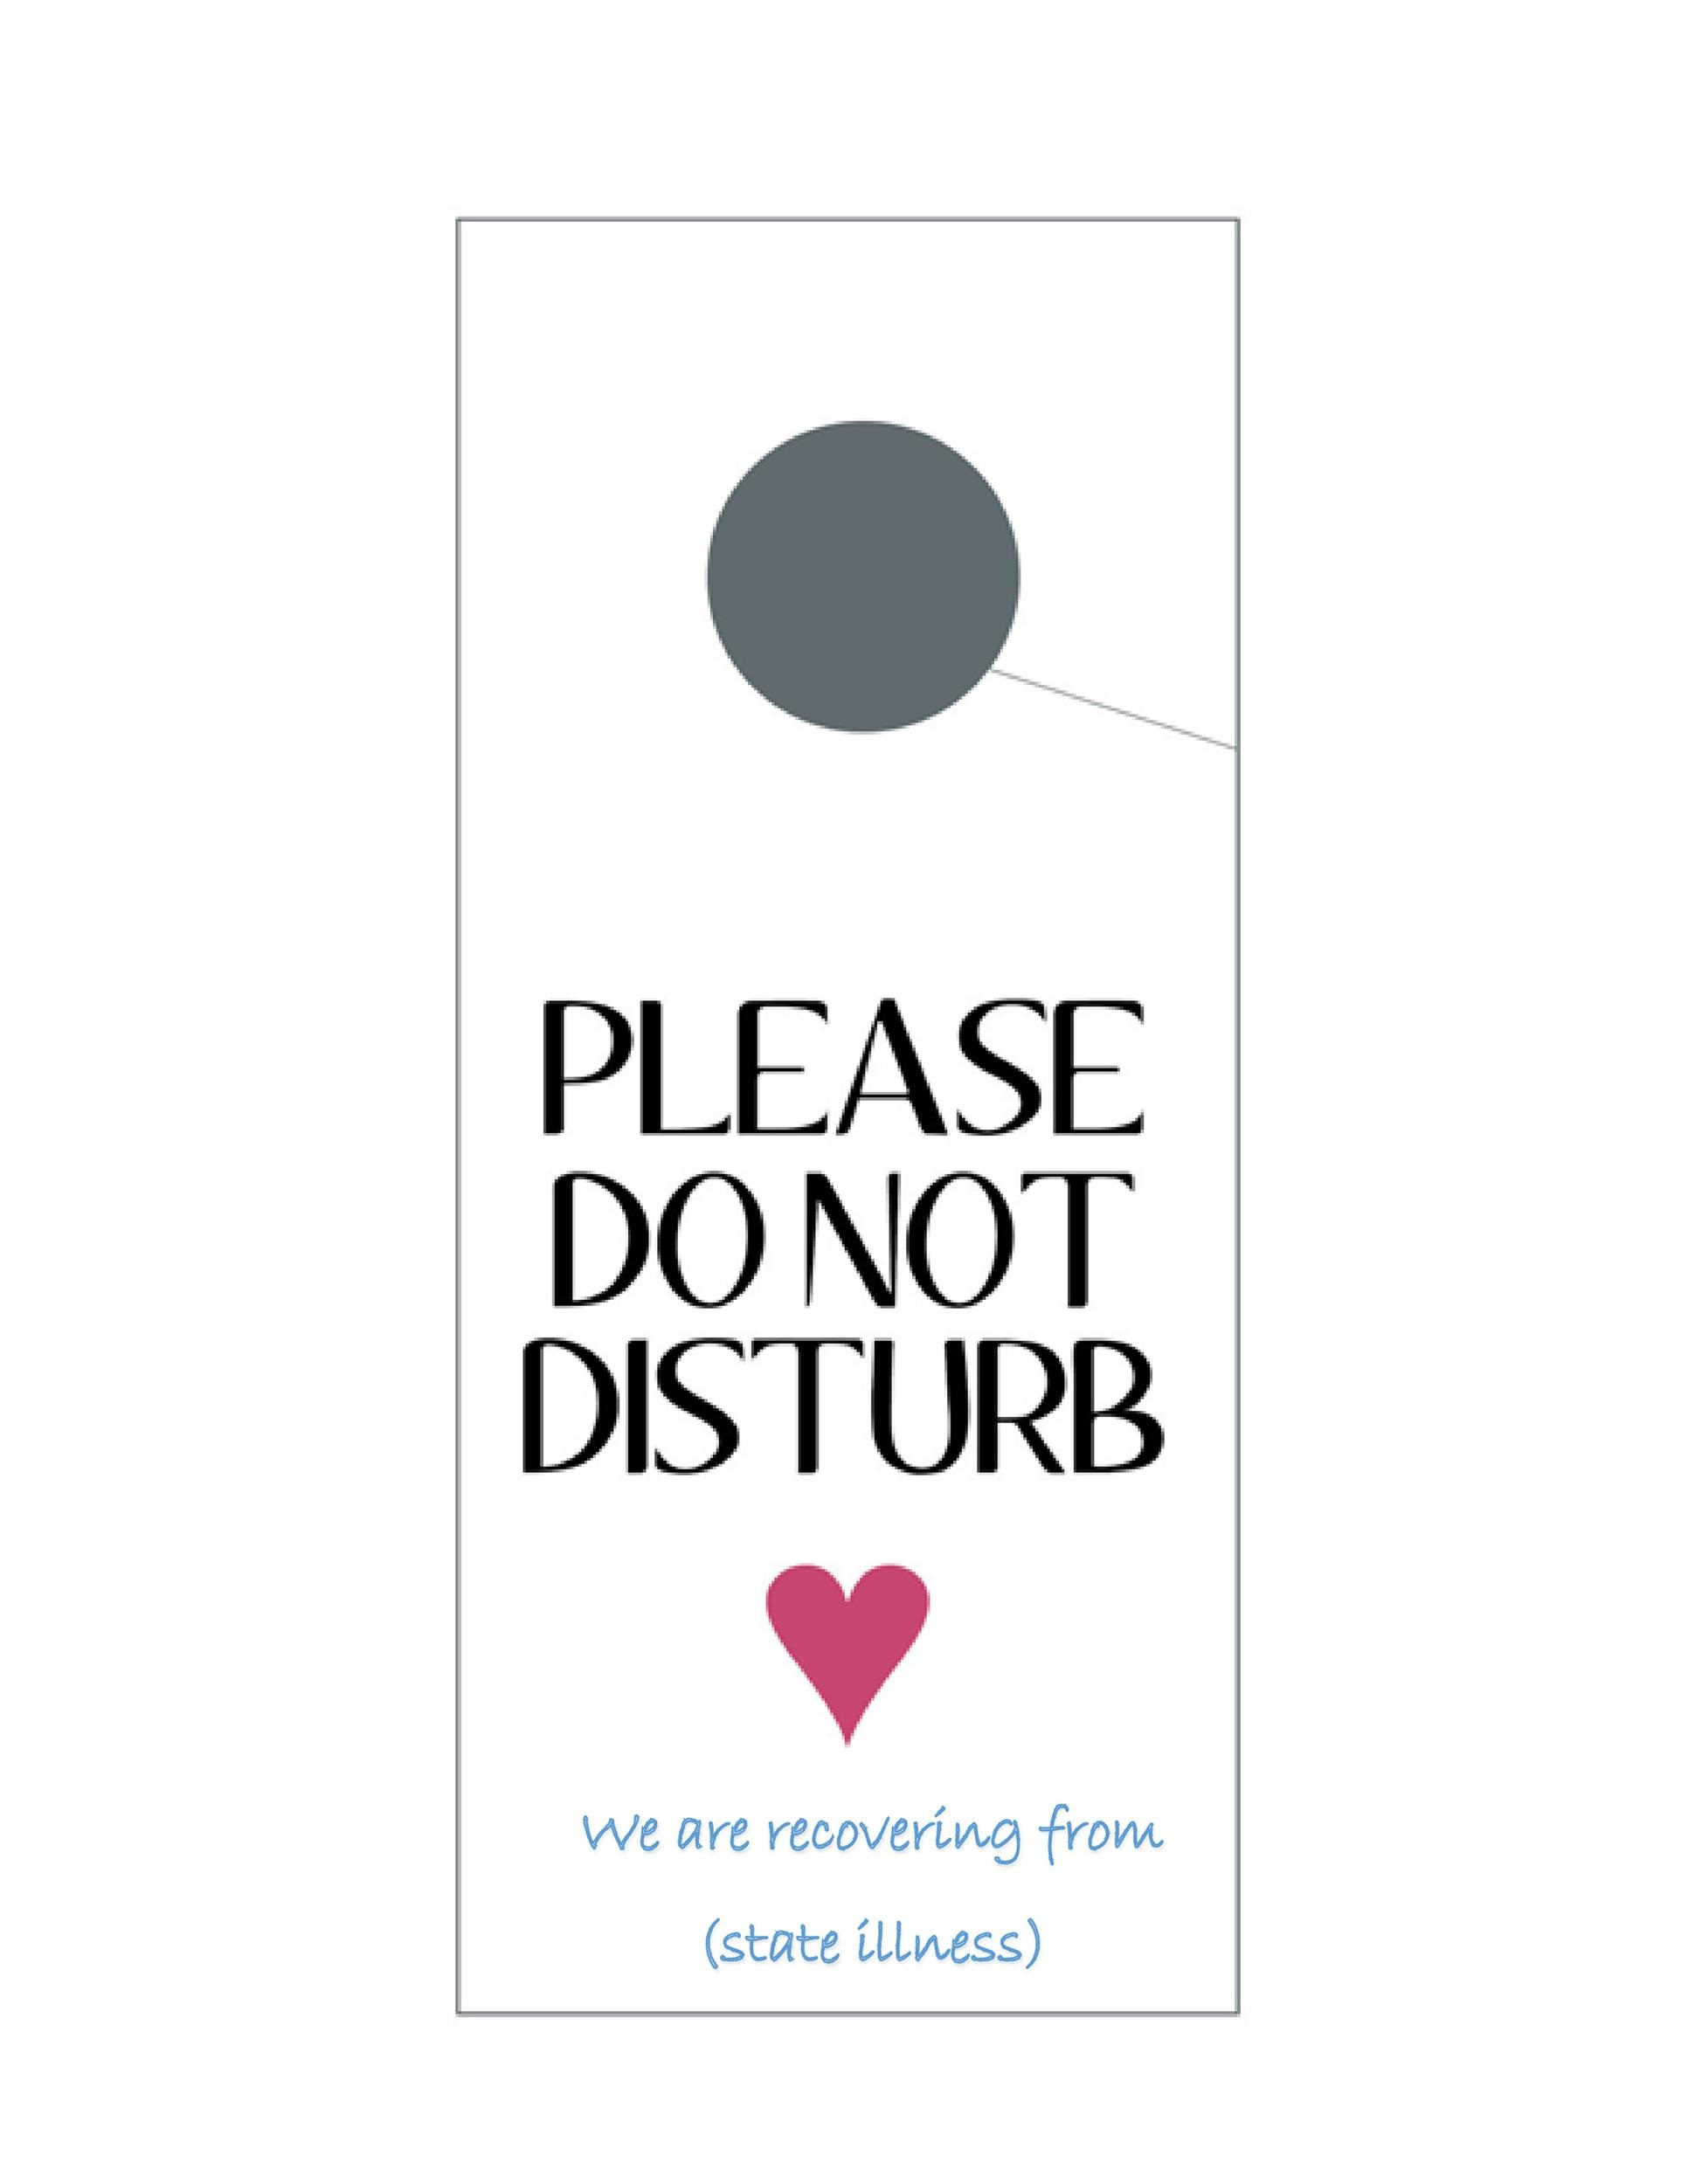 005 Wonderful Door Hanger Template For Word Inspiration  Free MicrosoftFull